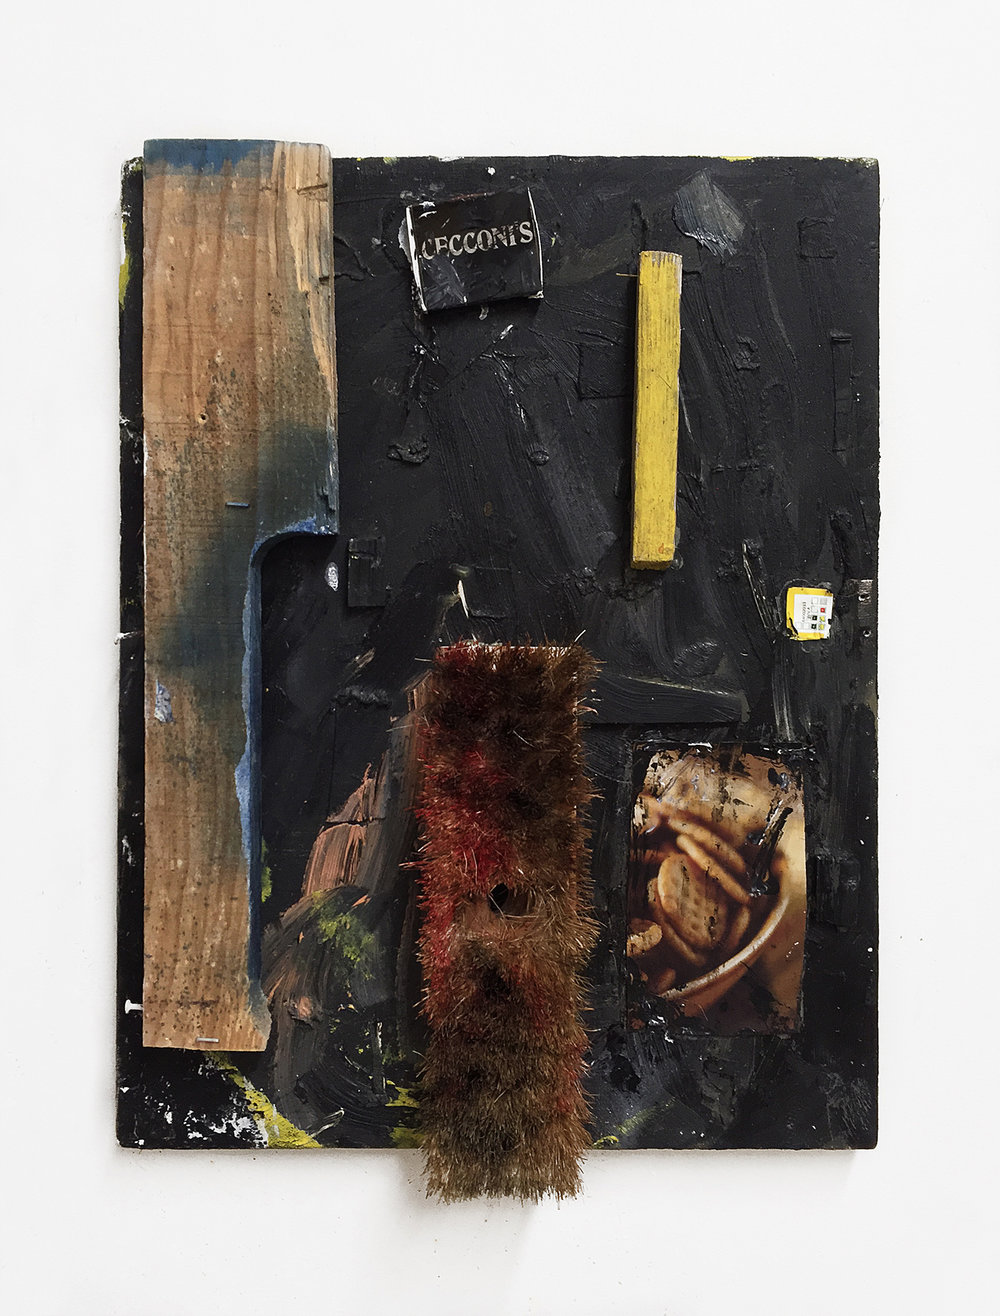 Untitled , 2018 Oil, wood, broom, matchbook, cardboard, cracker box, canvas 14in x 18in